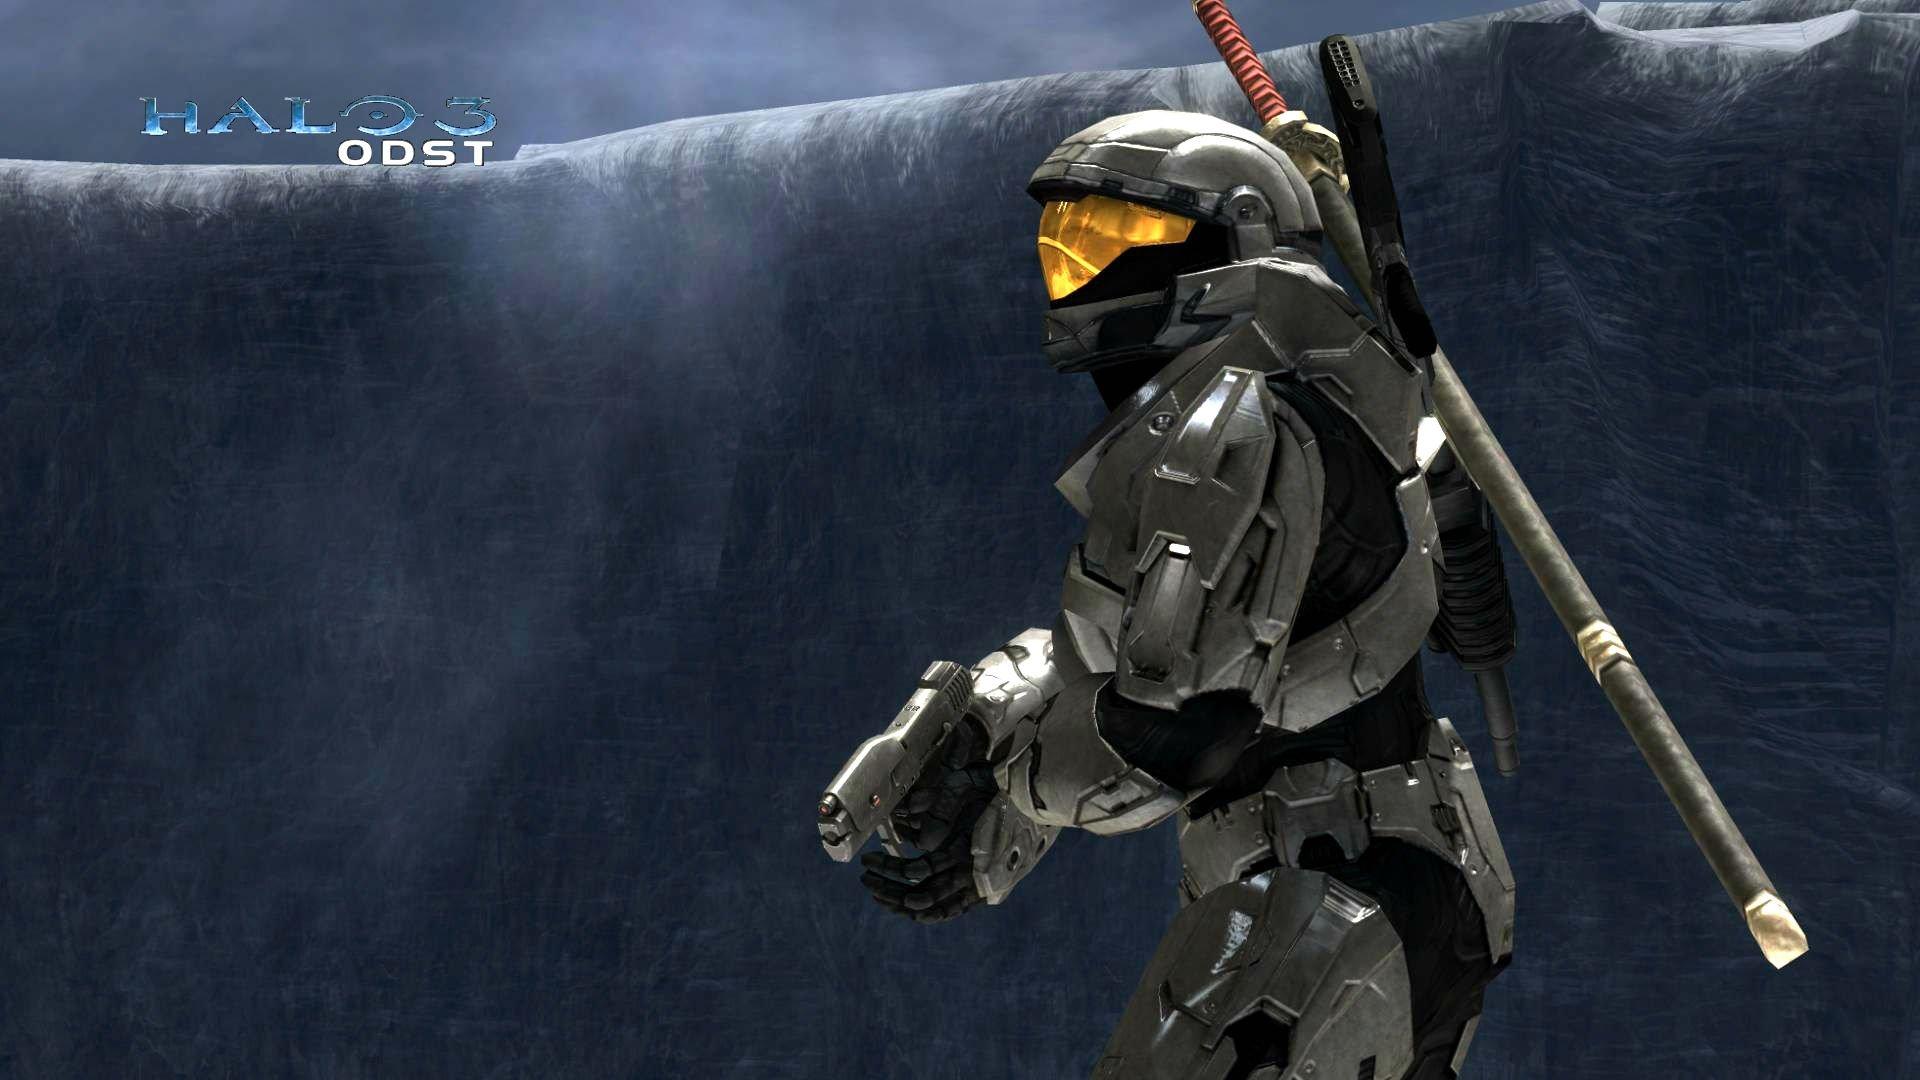 HALO 3 ODST Shooter Fps Sci Fi Futuristic Action Fighting War 1odst Warrior Weapon Gun Wallpaper